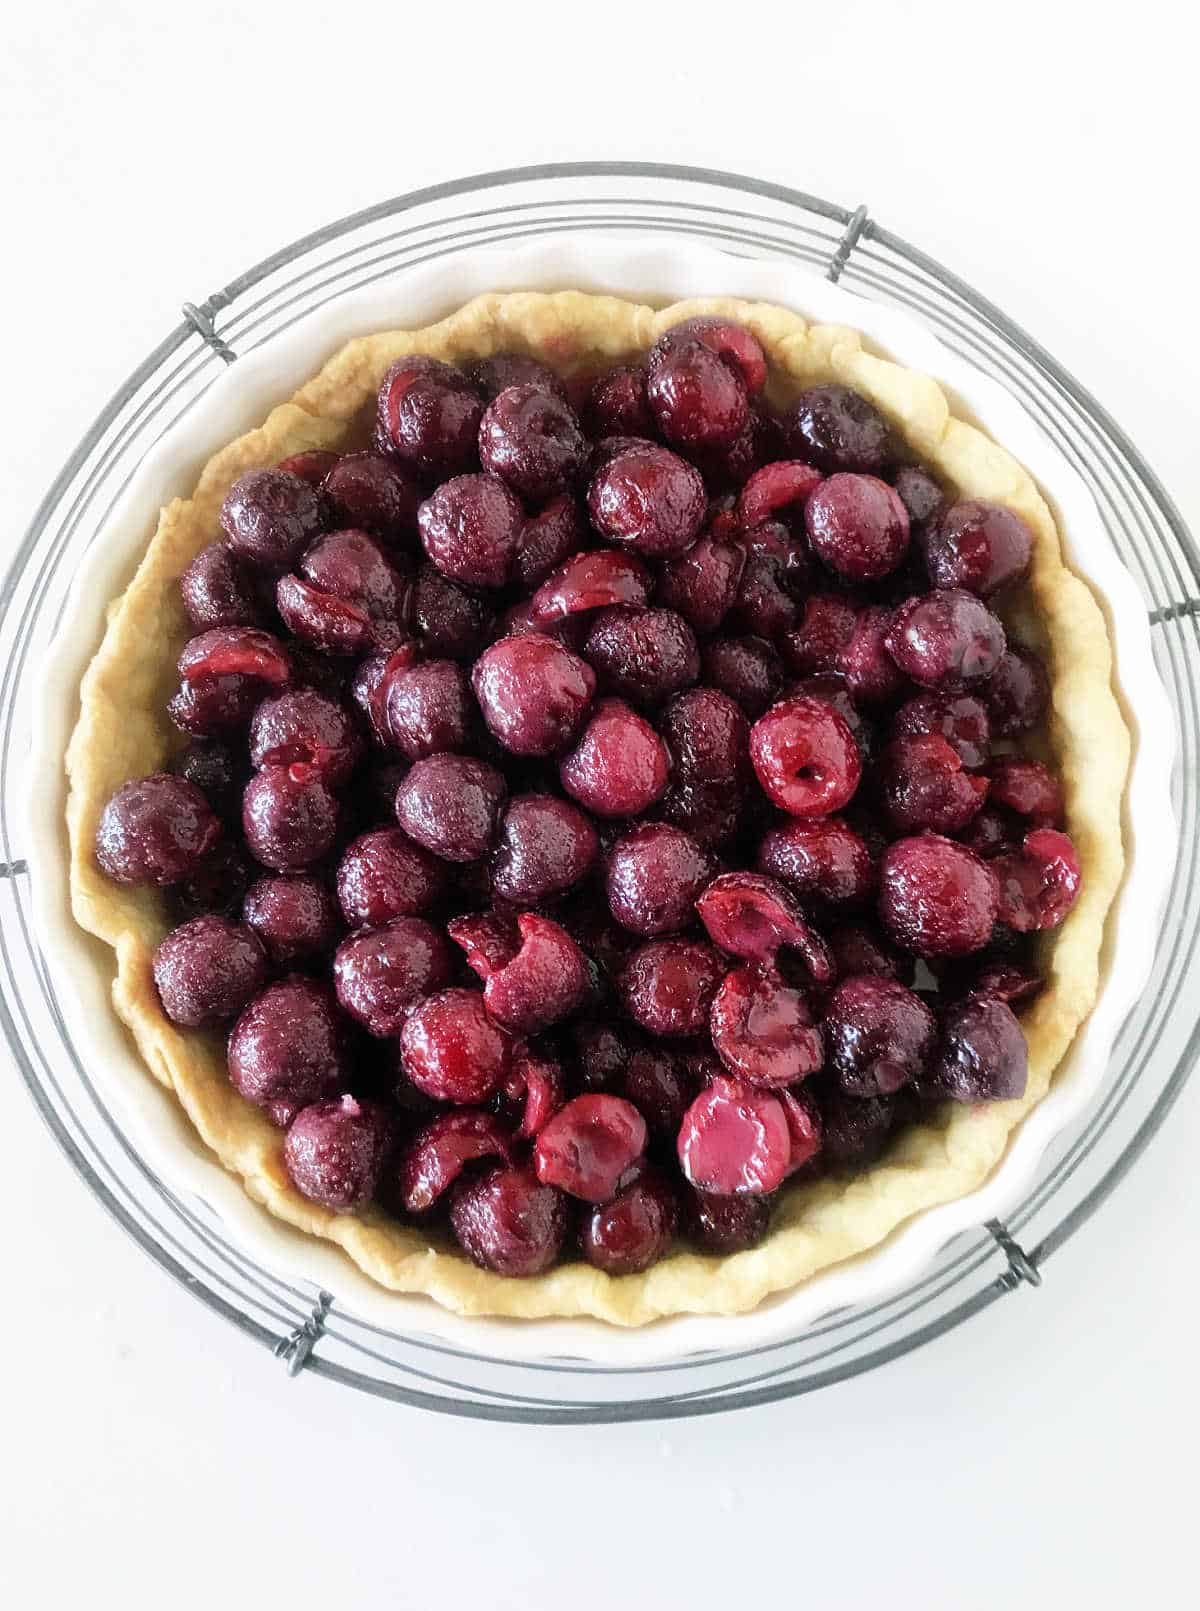 Cherry filled pie crust on wire rack, white background